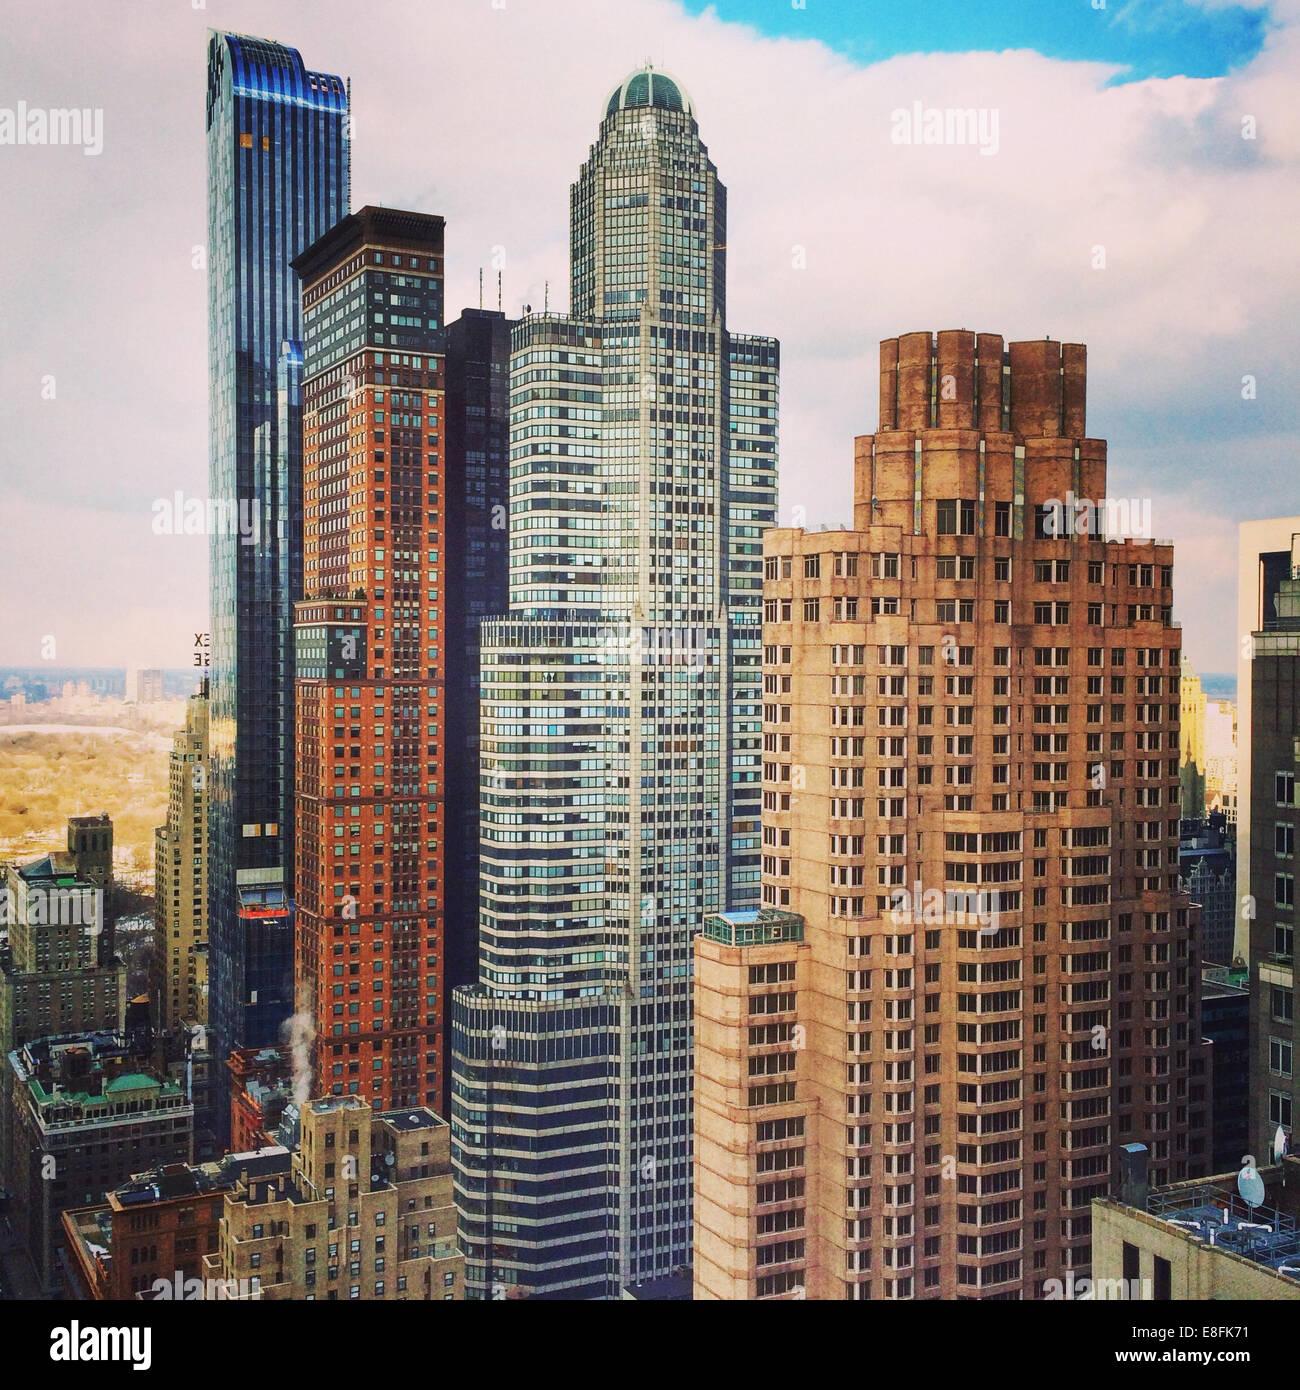 USA, New York State, New York City, Midtown Manhattan skyline - Stock Image